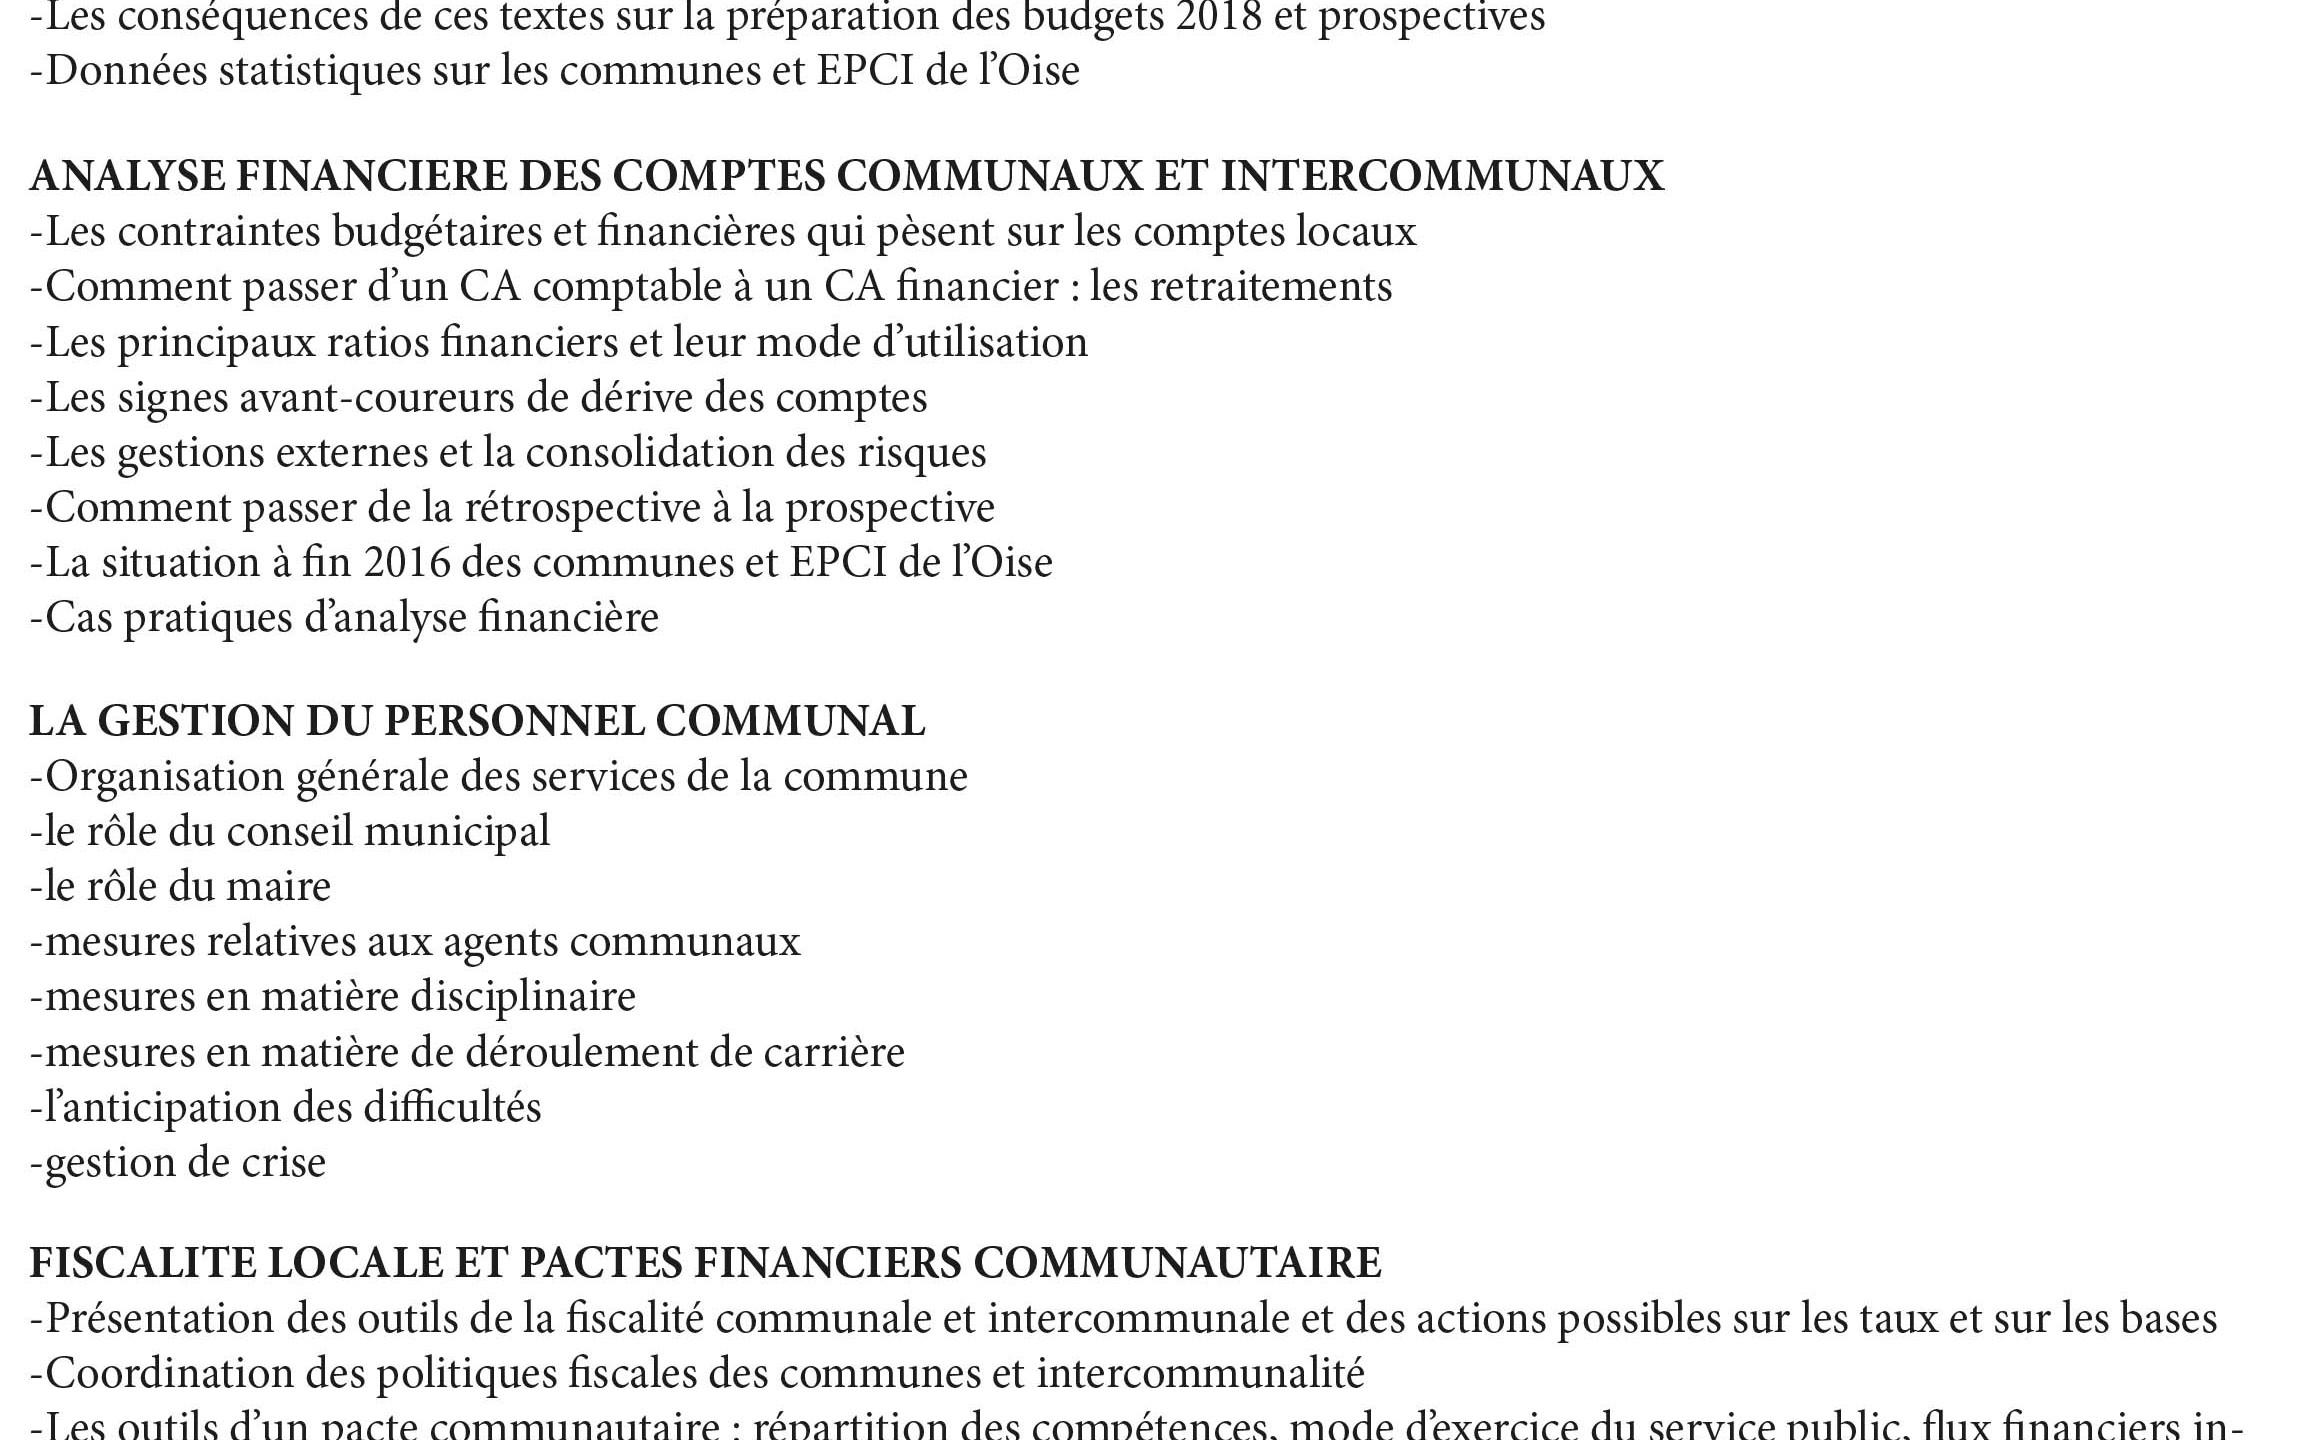 Programmes détaillés-1